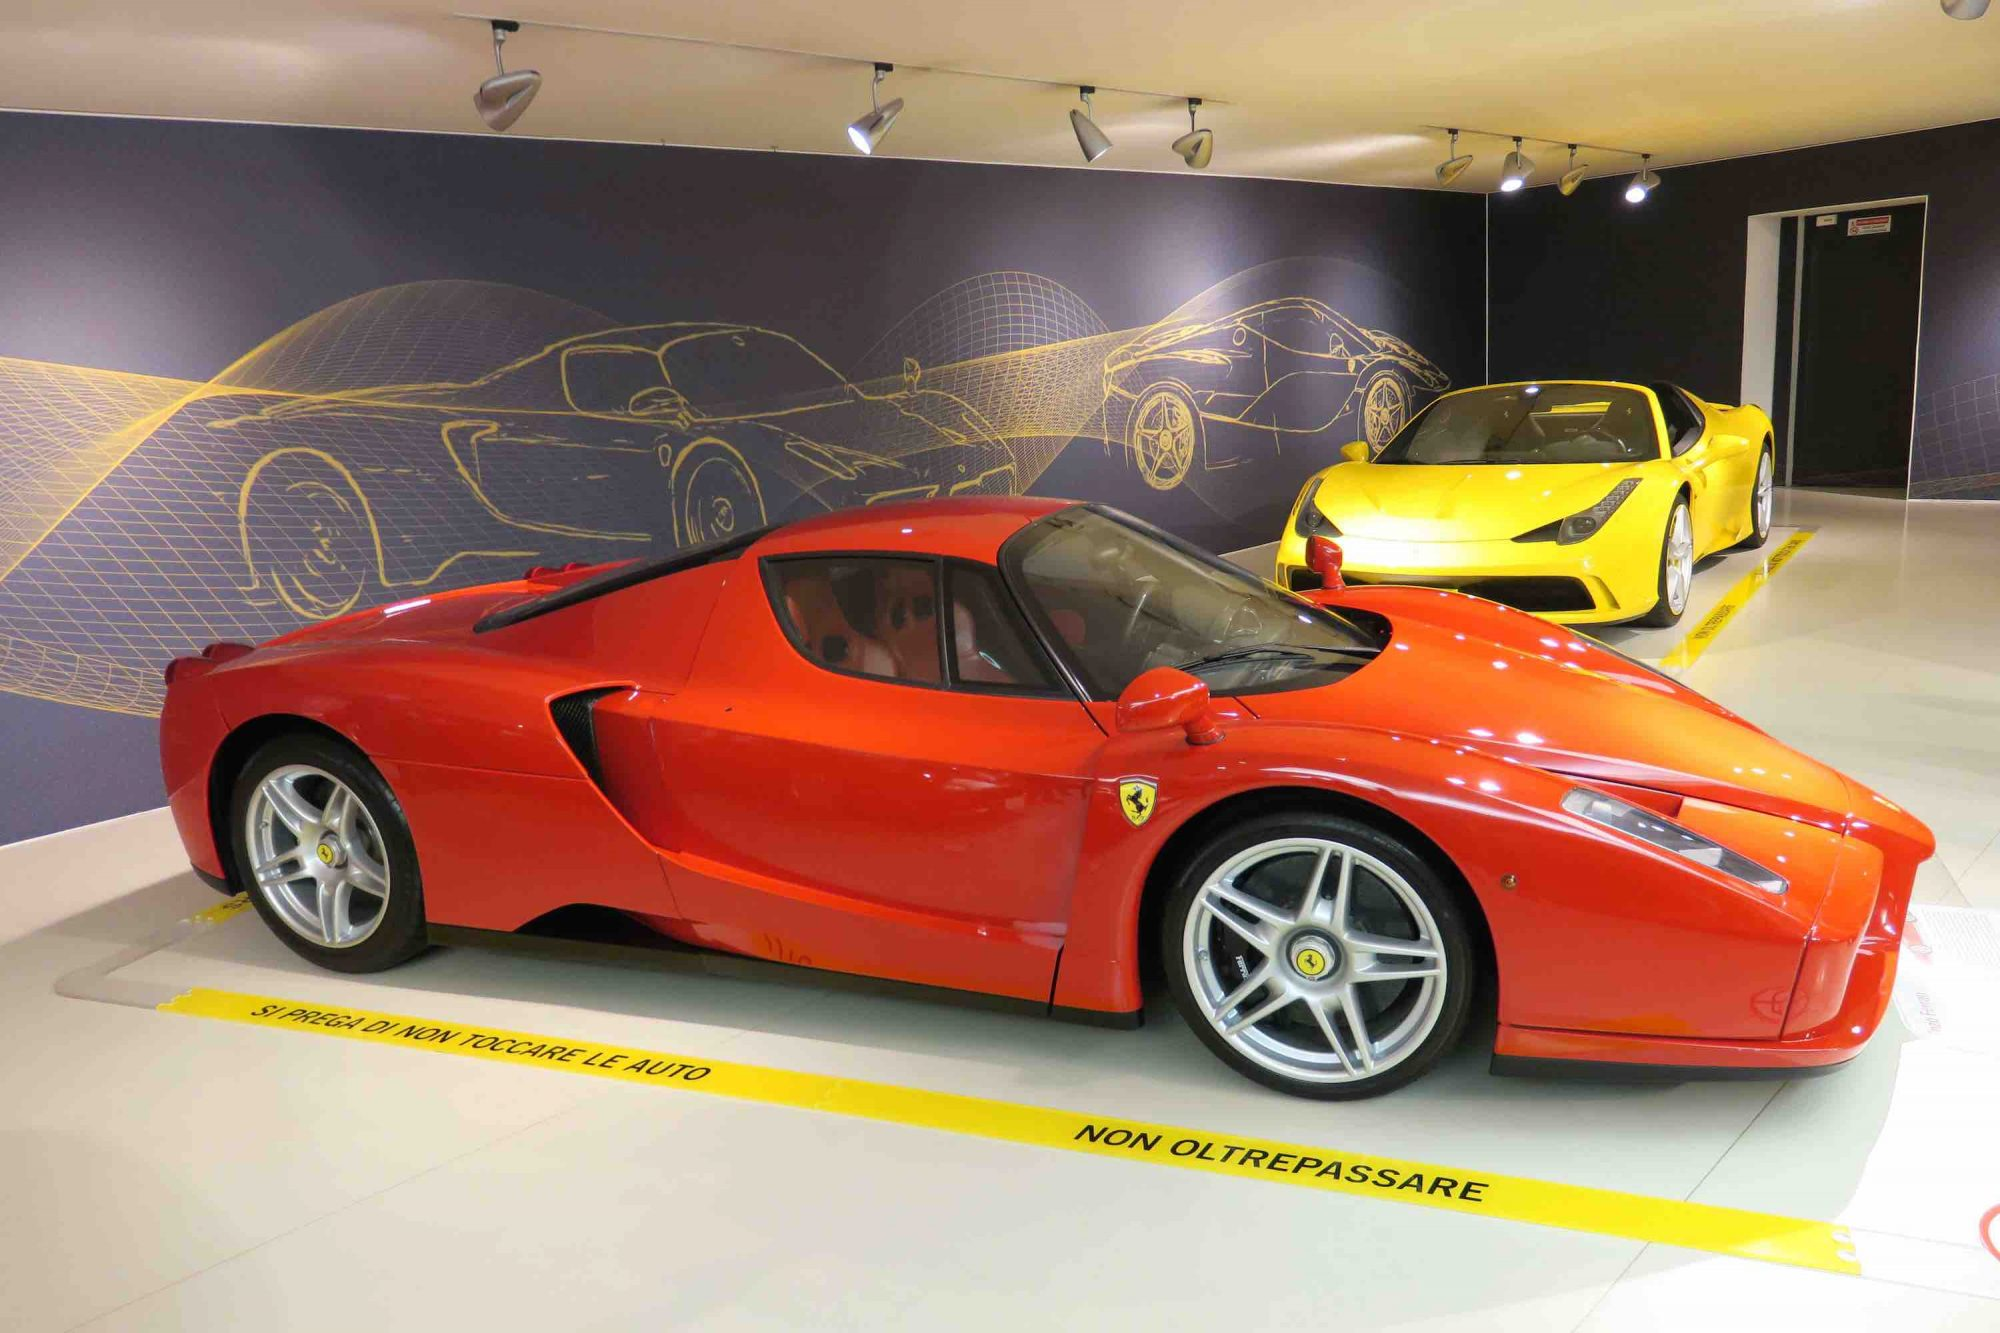 Test Drive With Ferrari Or Lamborghini In The Hills